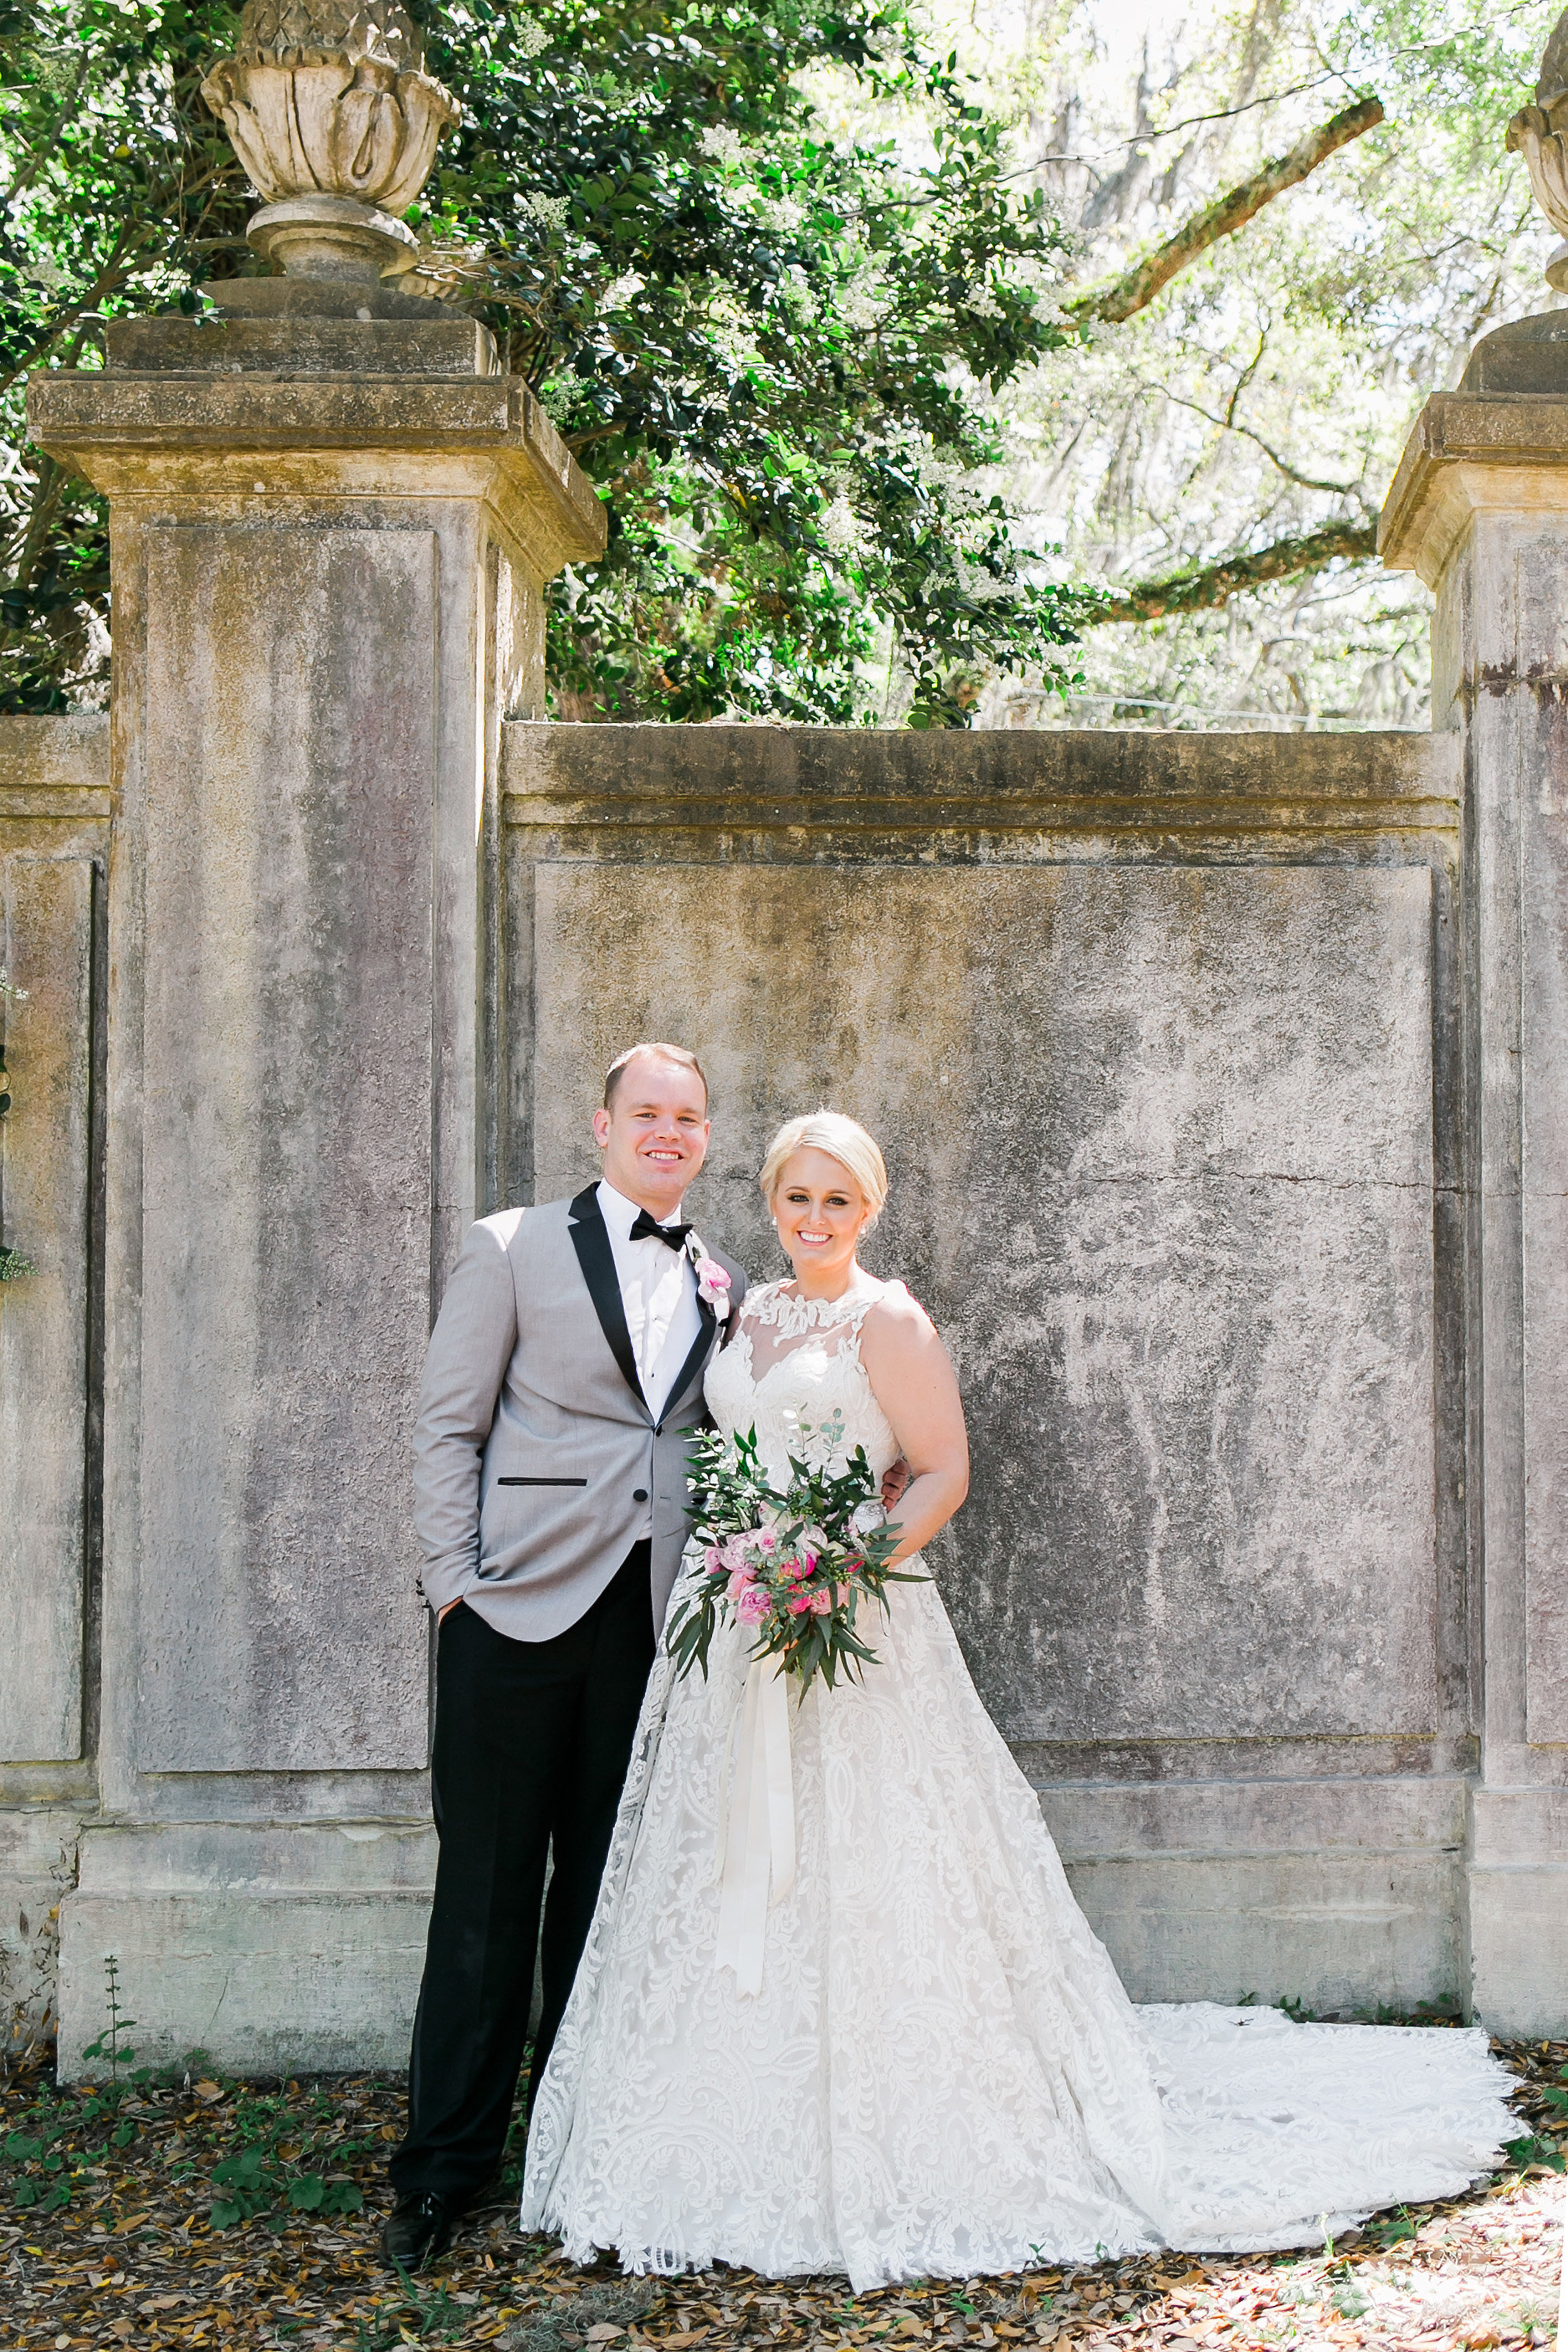 Savannah GA wedding portraits at Wormsloe Plantation by JB Marie Photography